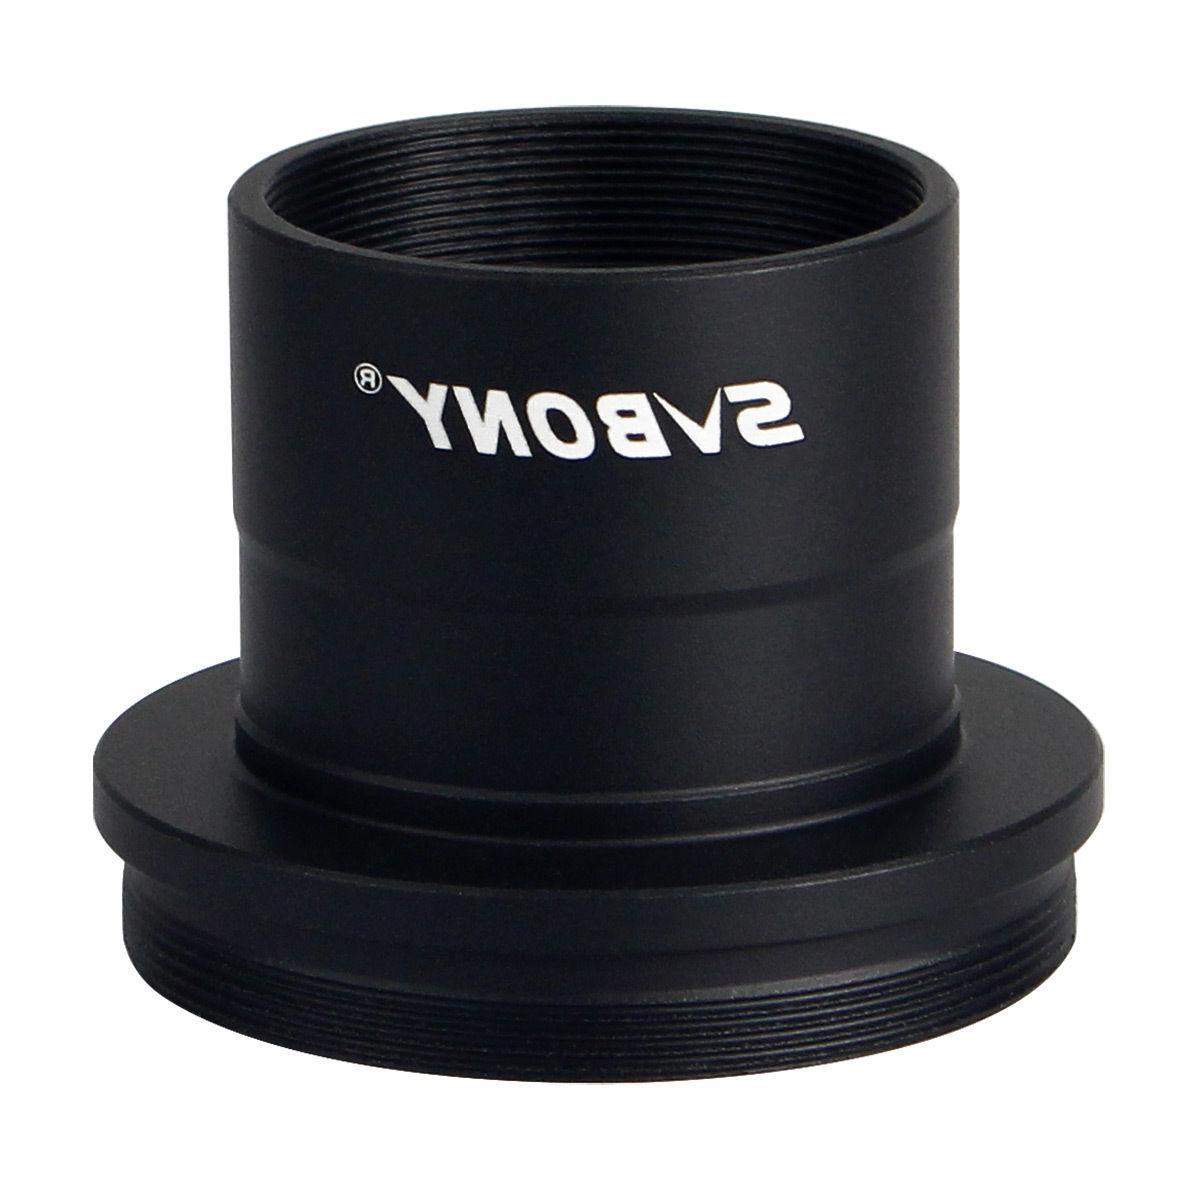 Nikon Lens + Mount Adapter